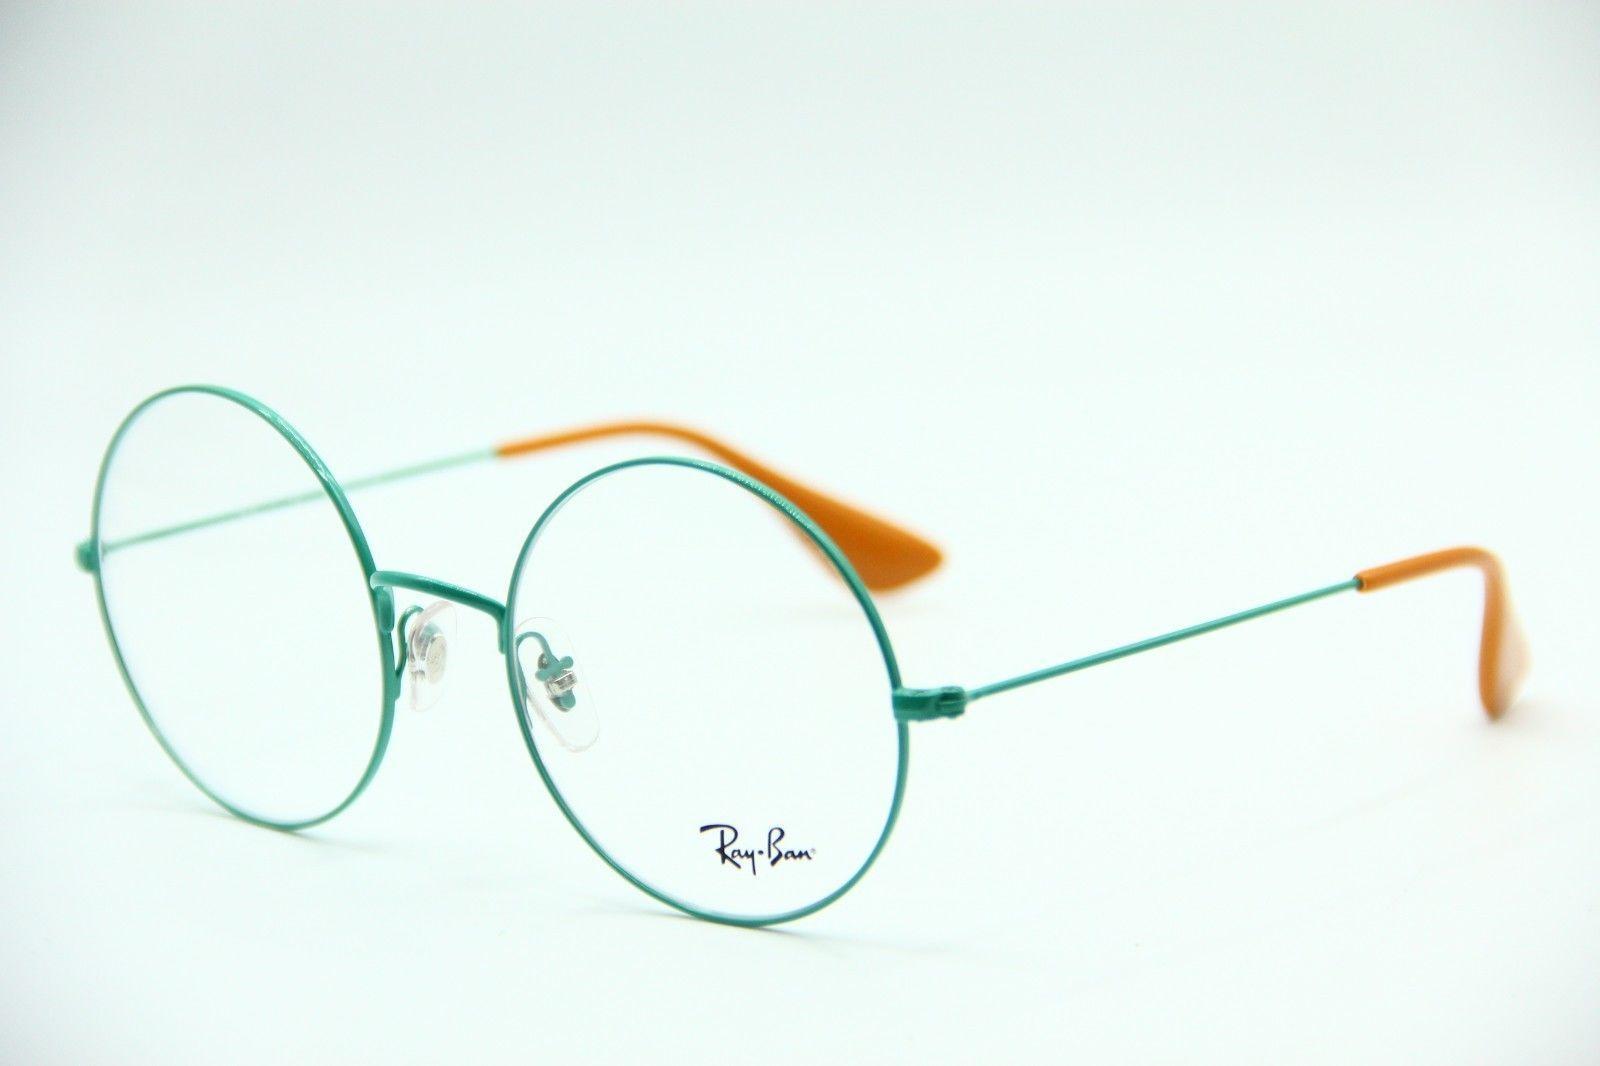 eb08f2c92f New RAY-BAN Rb 6392 2939 Green Eyeglasses and 50 similar items. 57